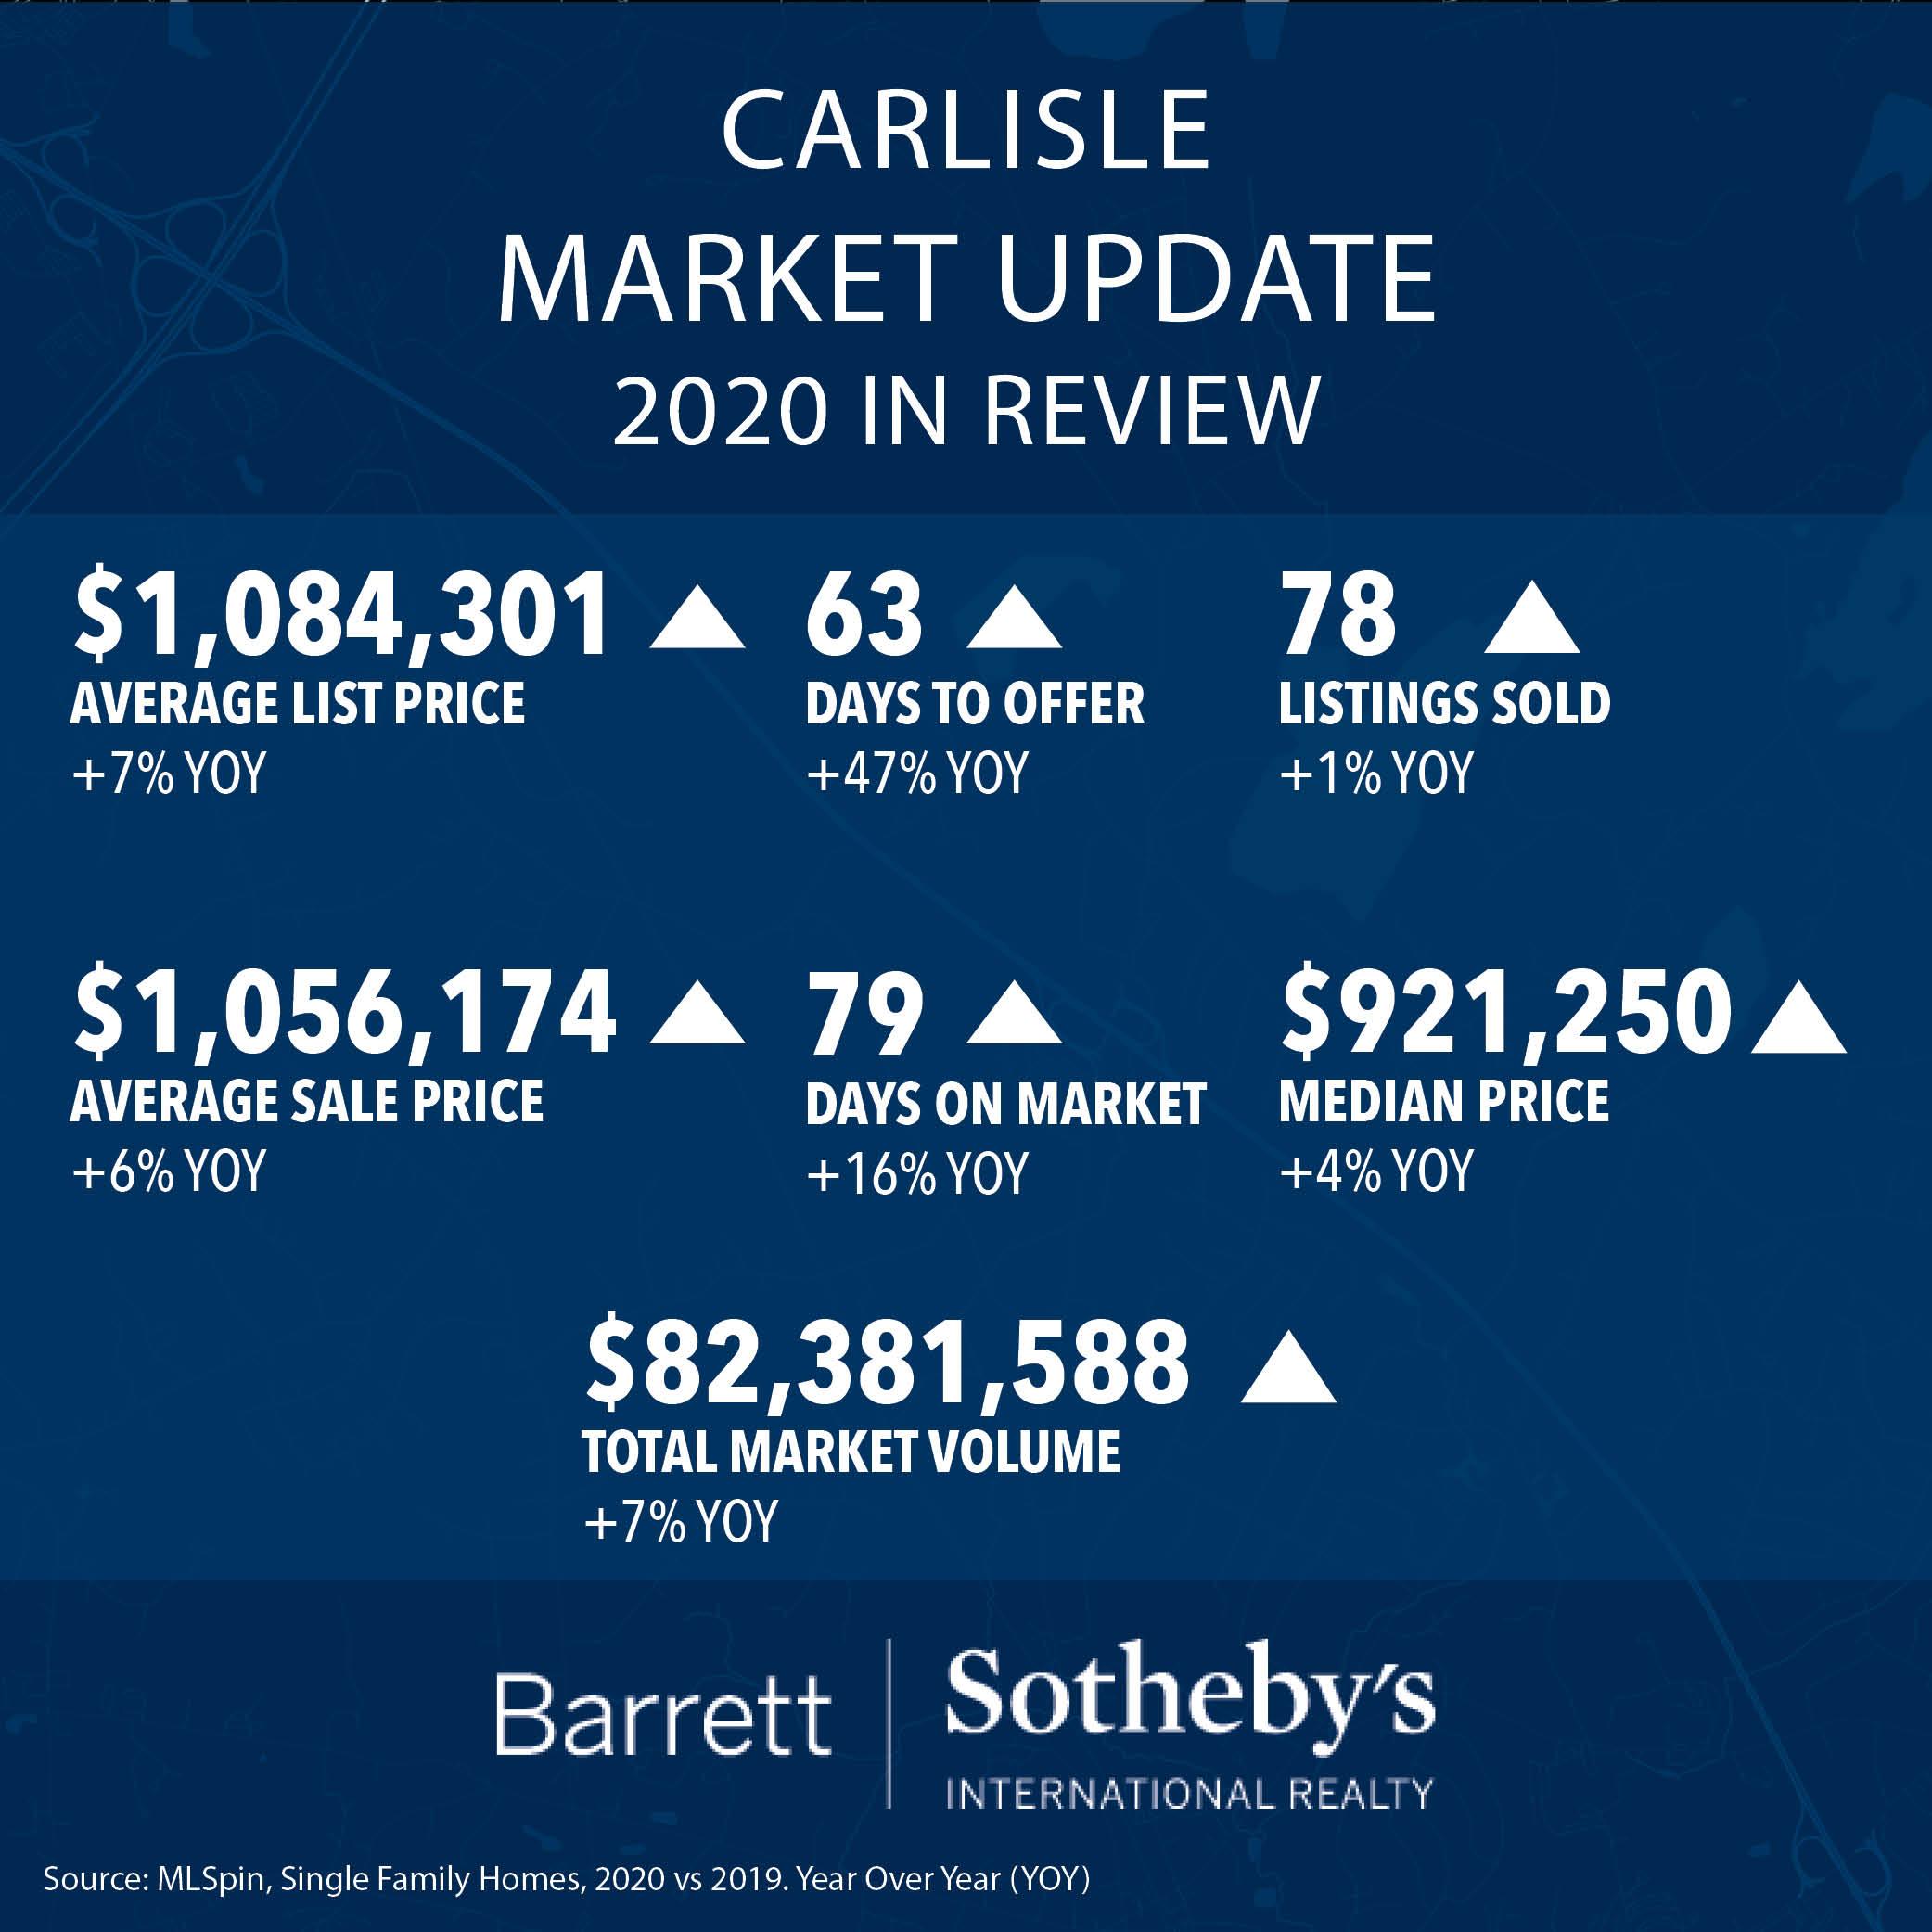 Carlisle Market Update: 2020 in Review